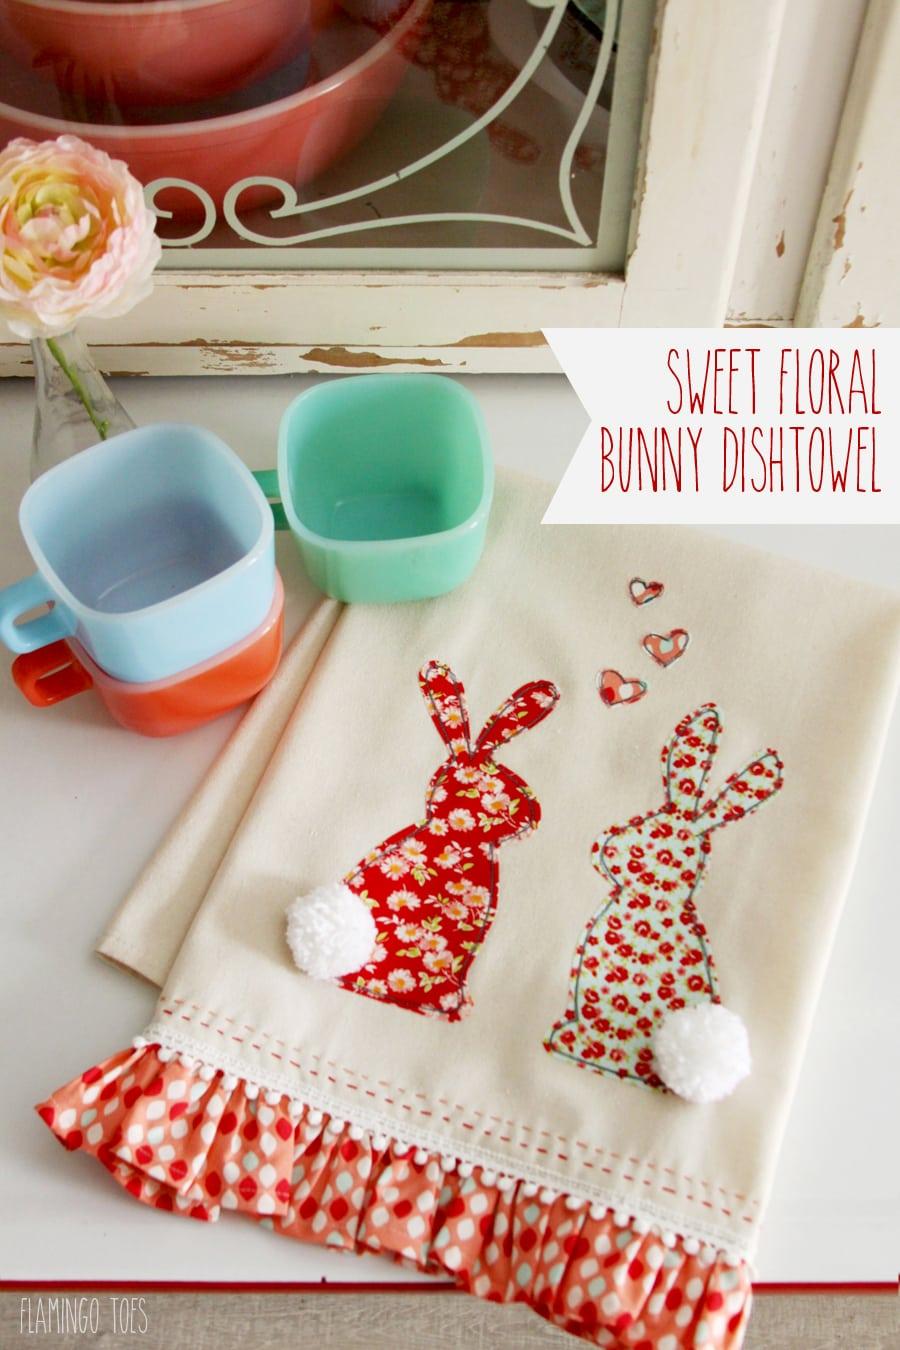 Sweet Floral Bunny Towel Sewing Tutorial @ Flamingo Toes